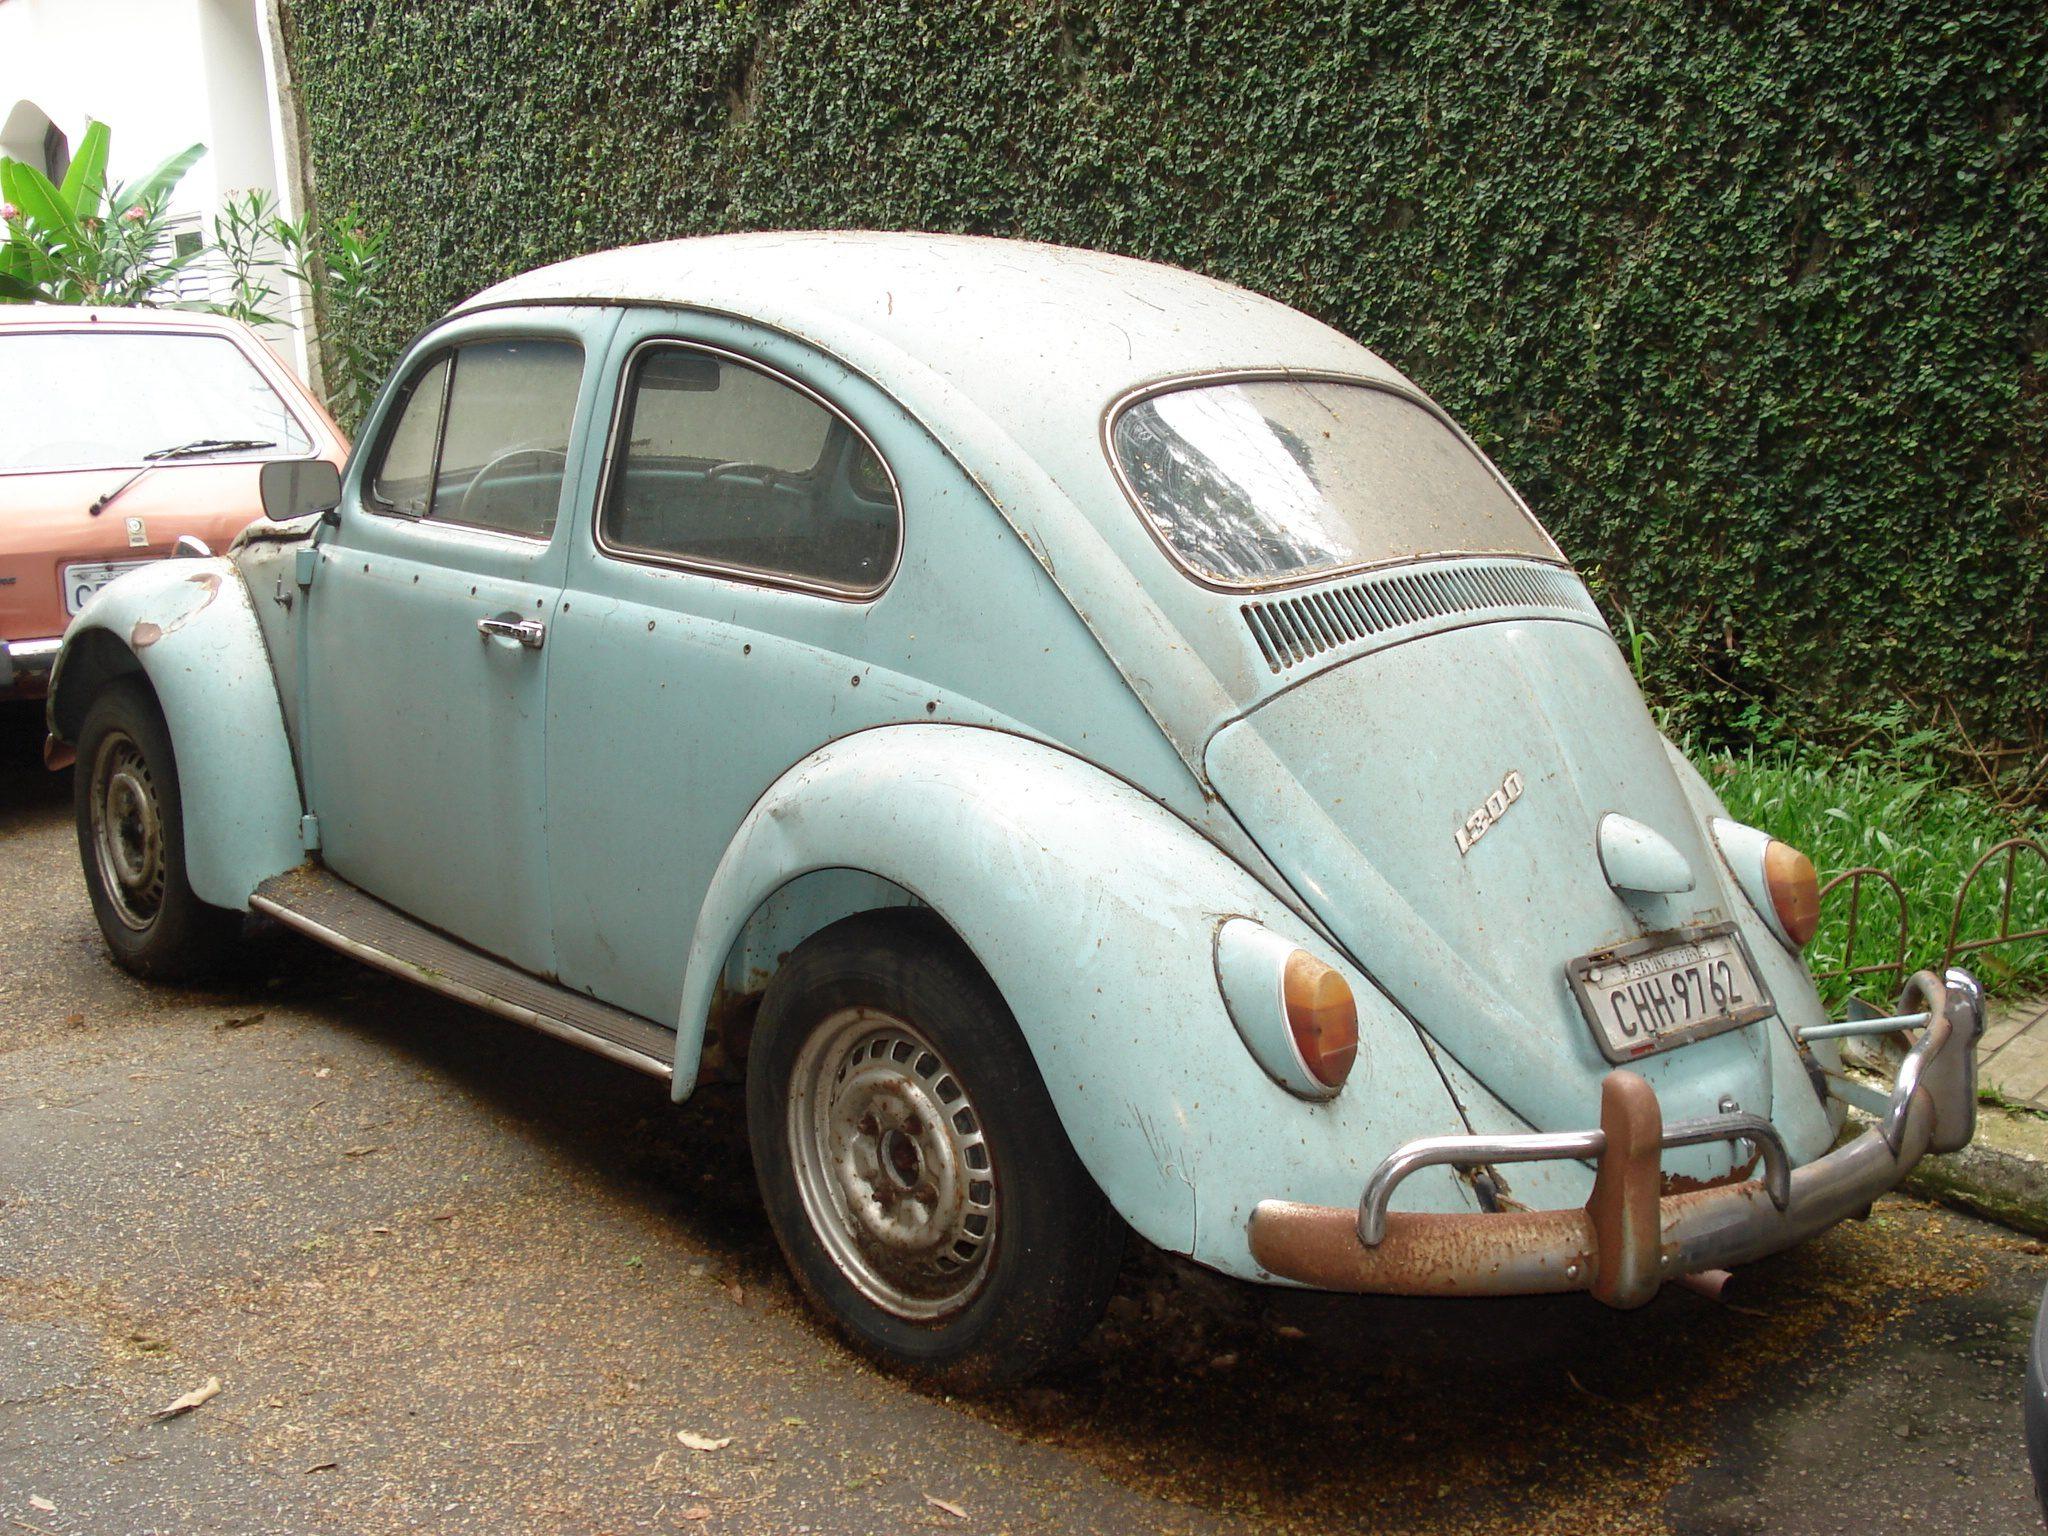 uFelipe-fusca_interlagos-3 Volkswagen Fusca